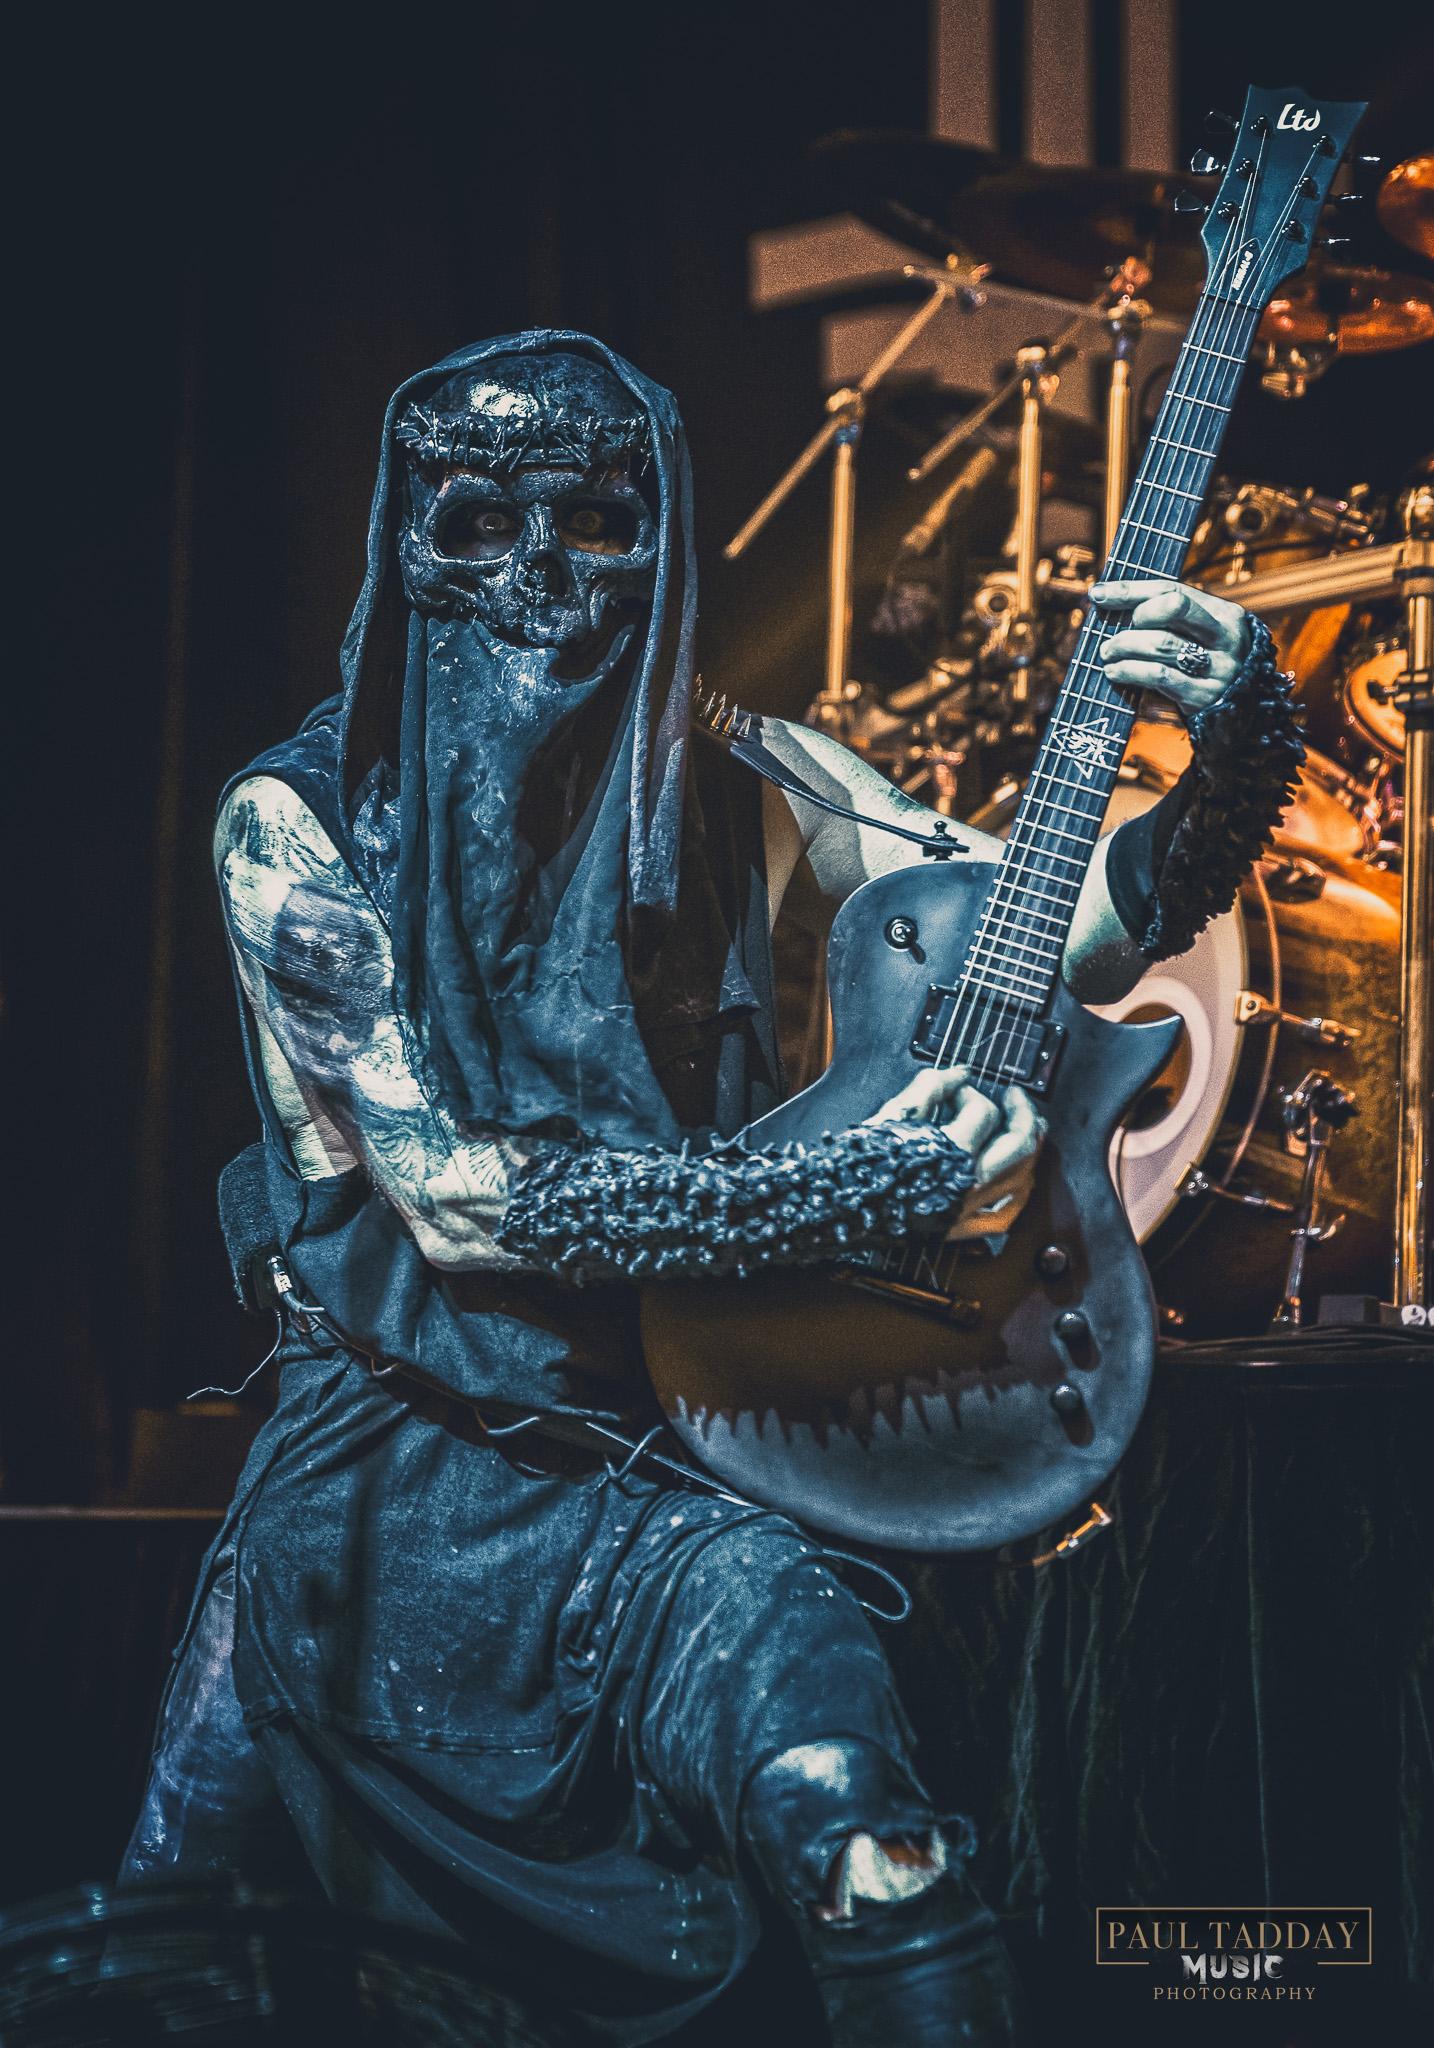 behemoth - brisbane - march 7 2019 - web - paul tadday photography - 23.jpg